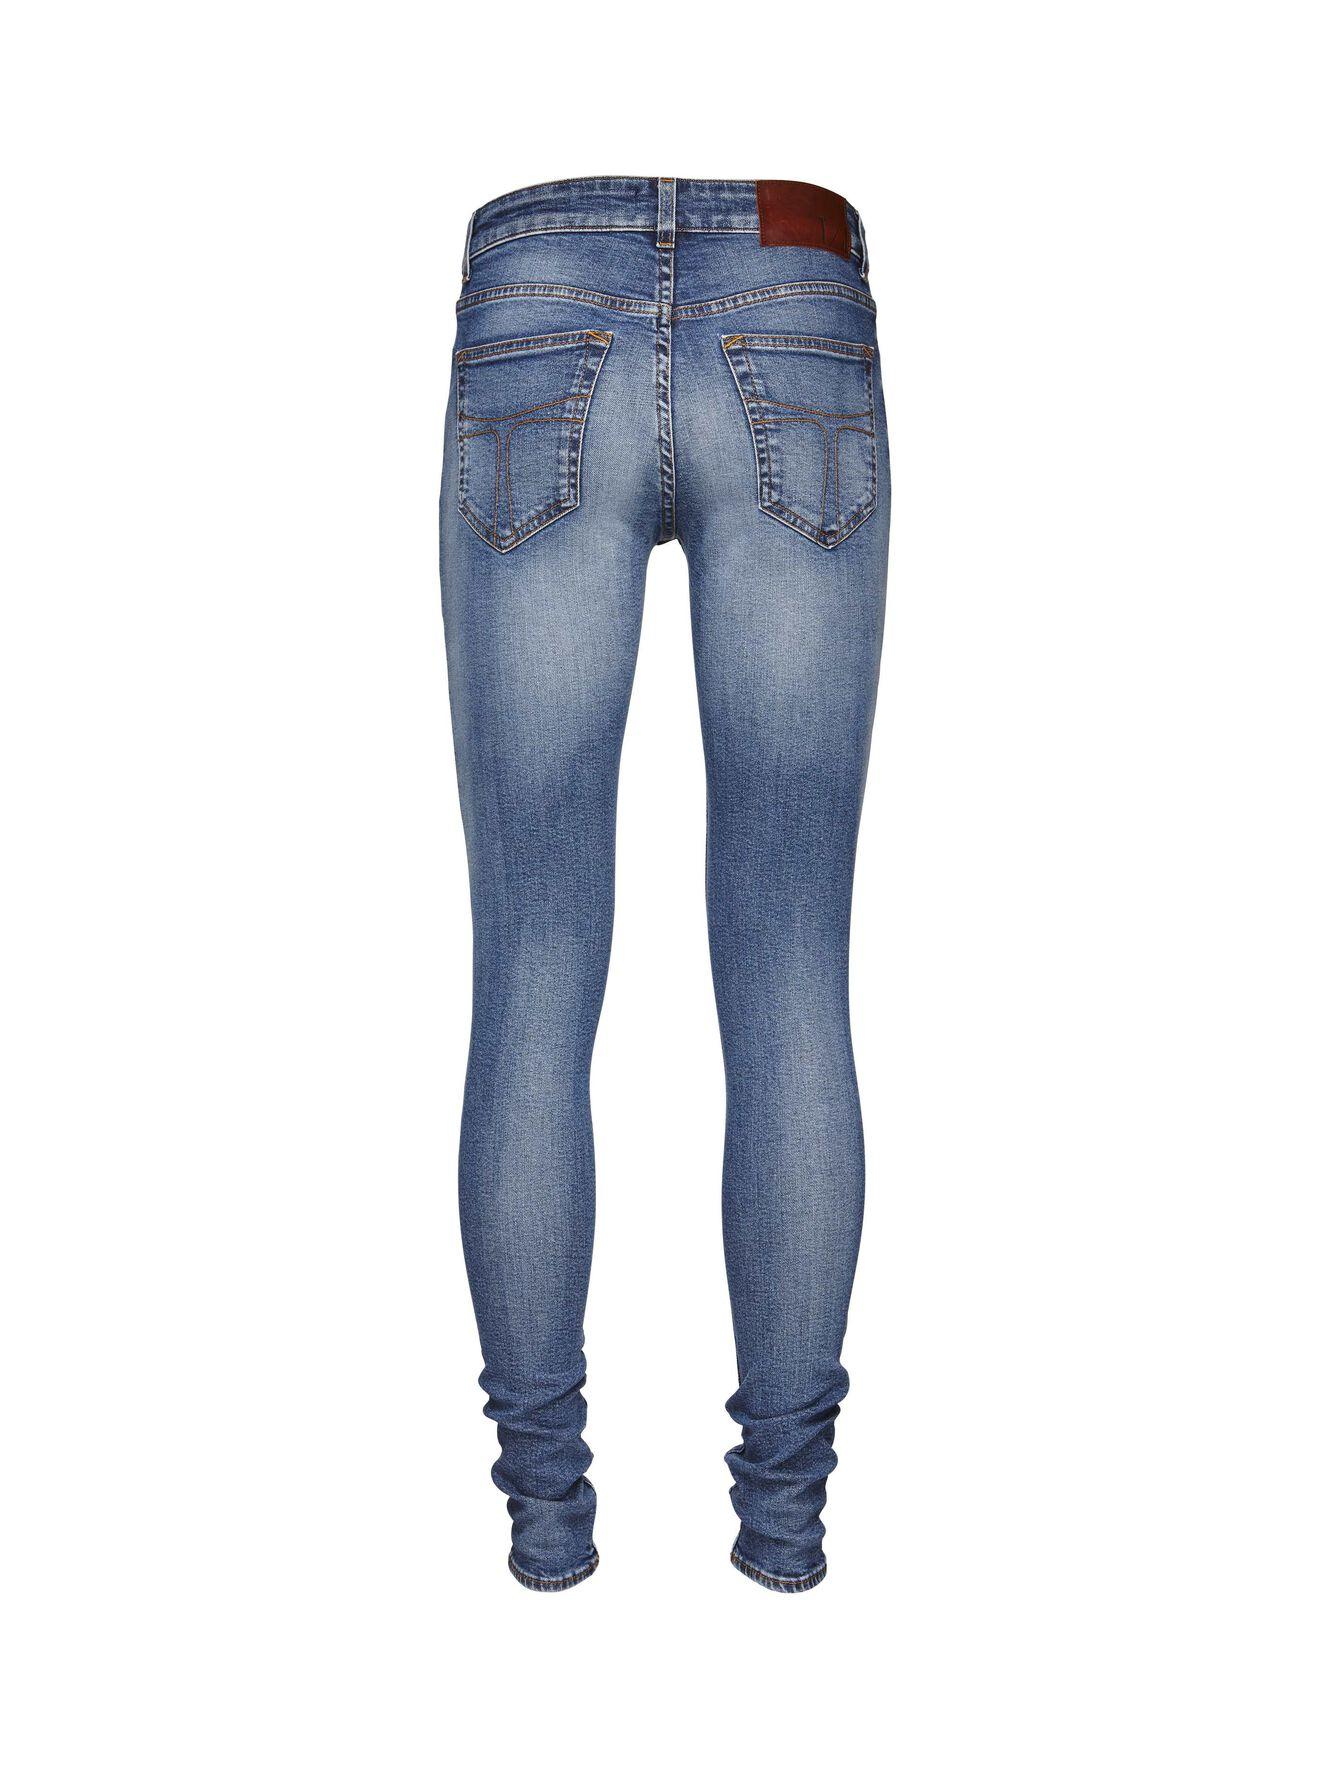 SLIGHT jeans  in Light blue from Tiger of Sweden